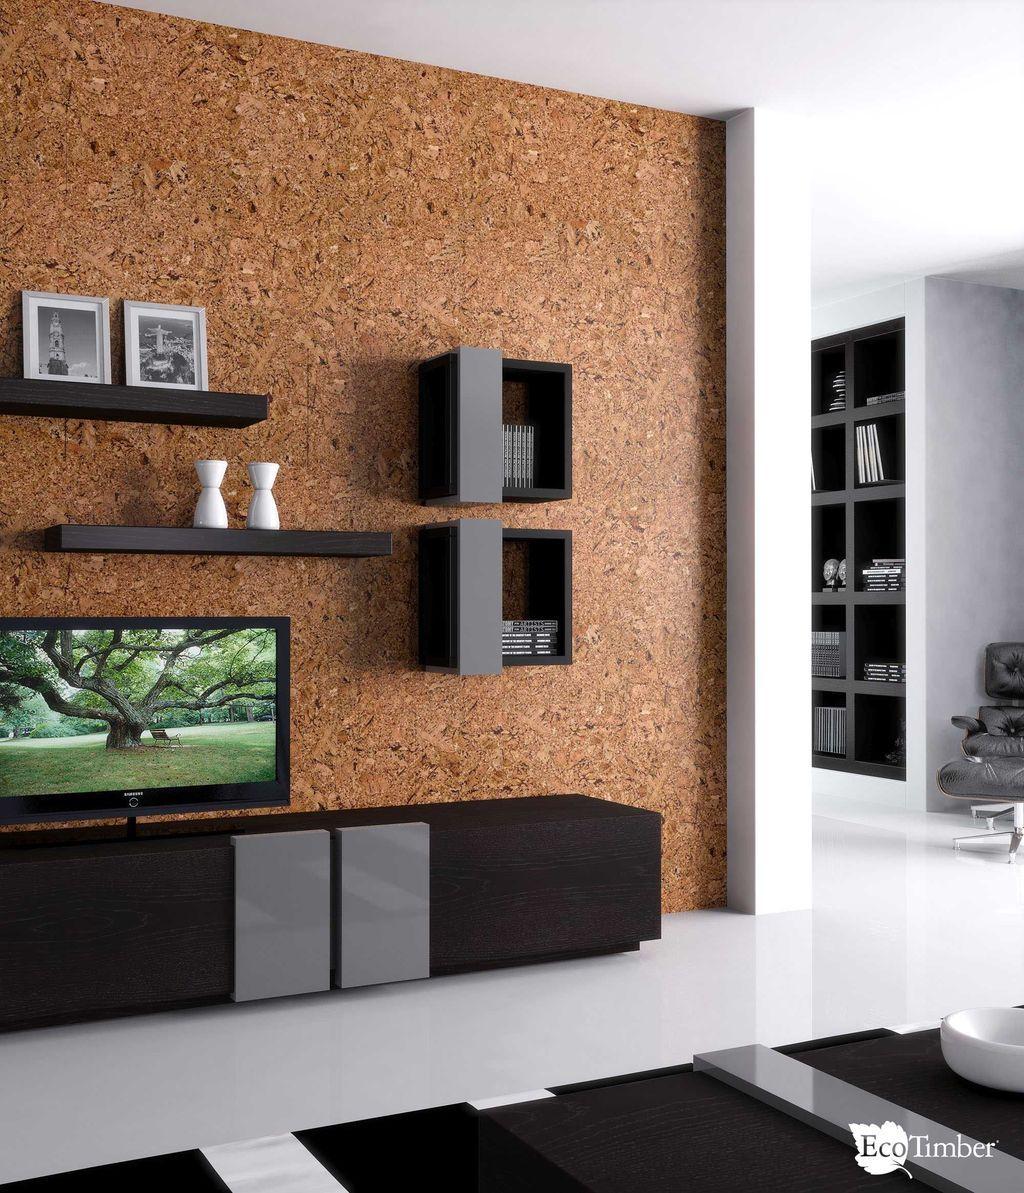 36 Lovely Tile Wall For Living Room Decorations In 2020 Wall Tiles Living Room Cork Board Wall Room Wall Tiles